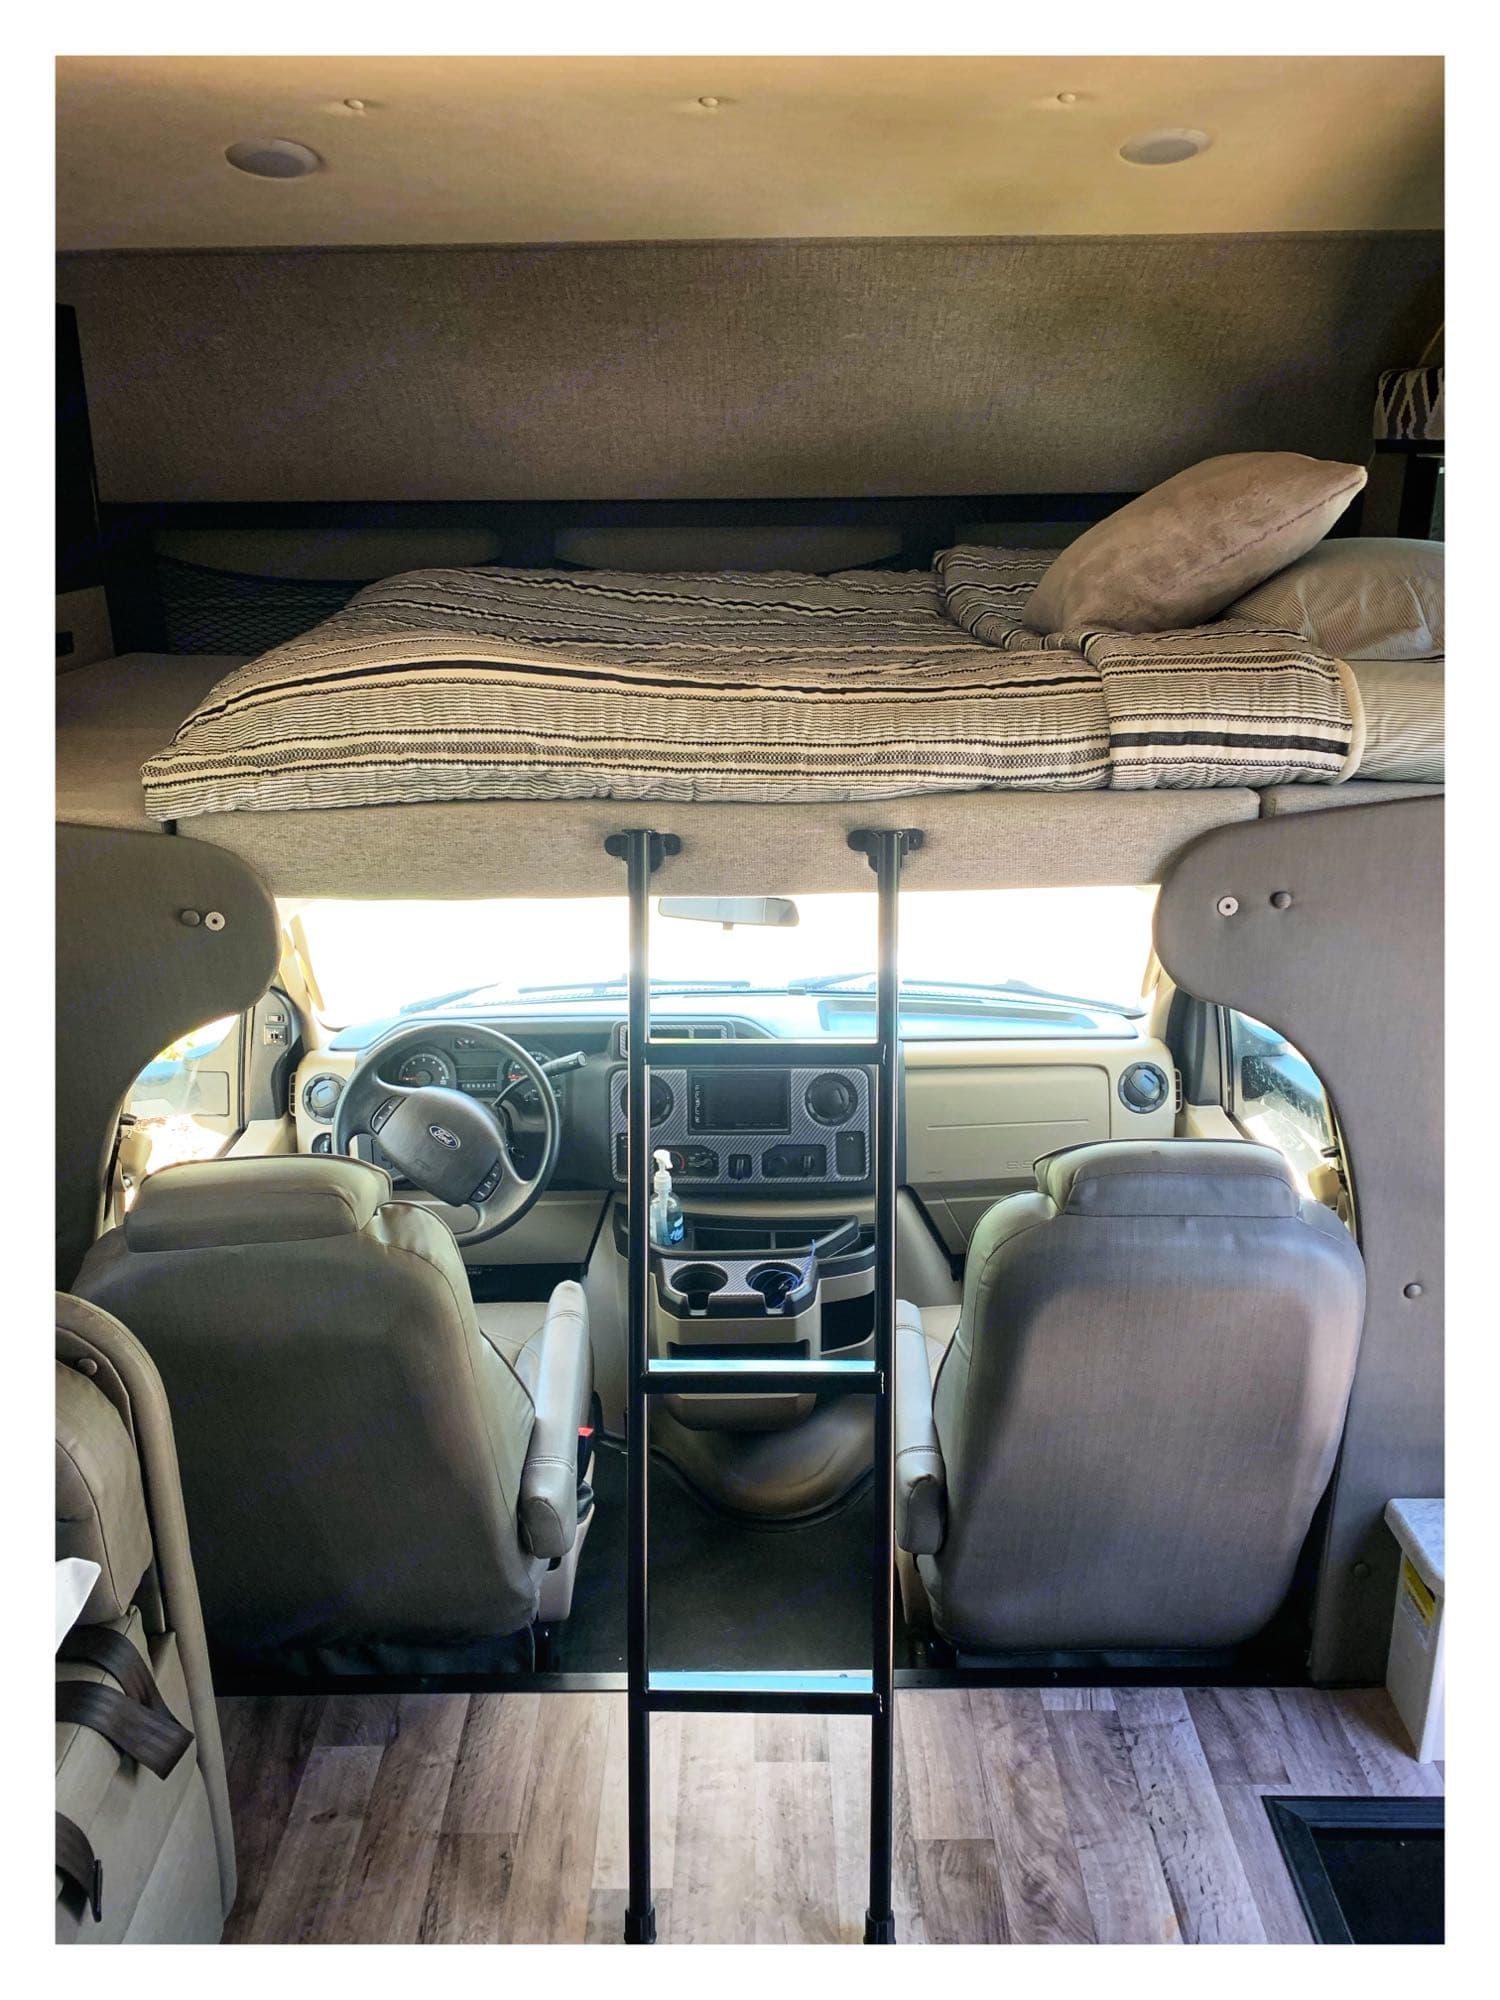 cockpit with full bunk above. Jayco Greyhawk 2020